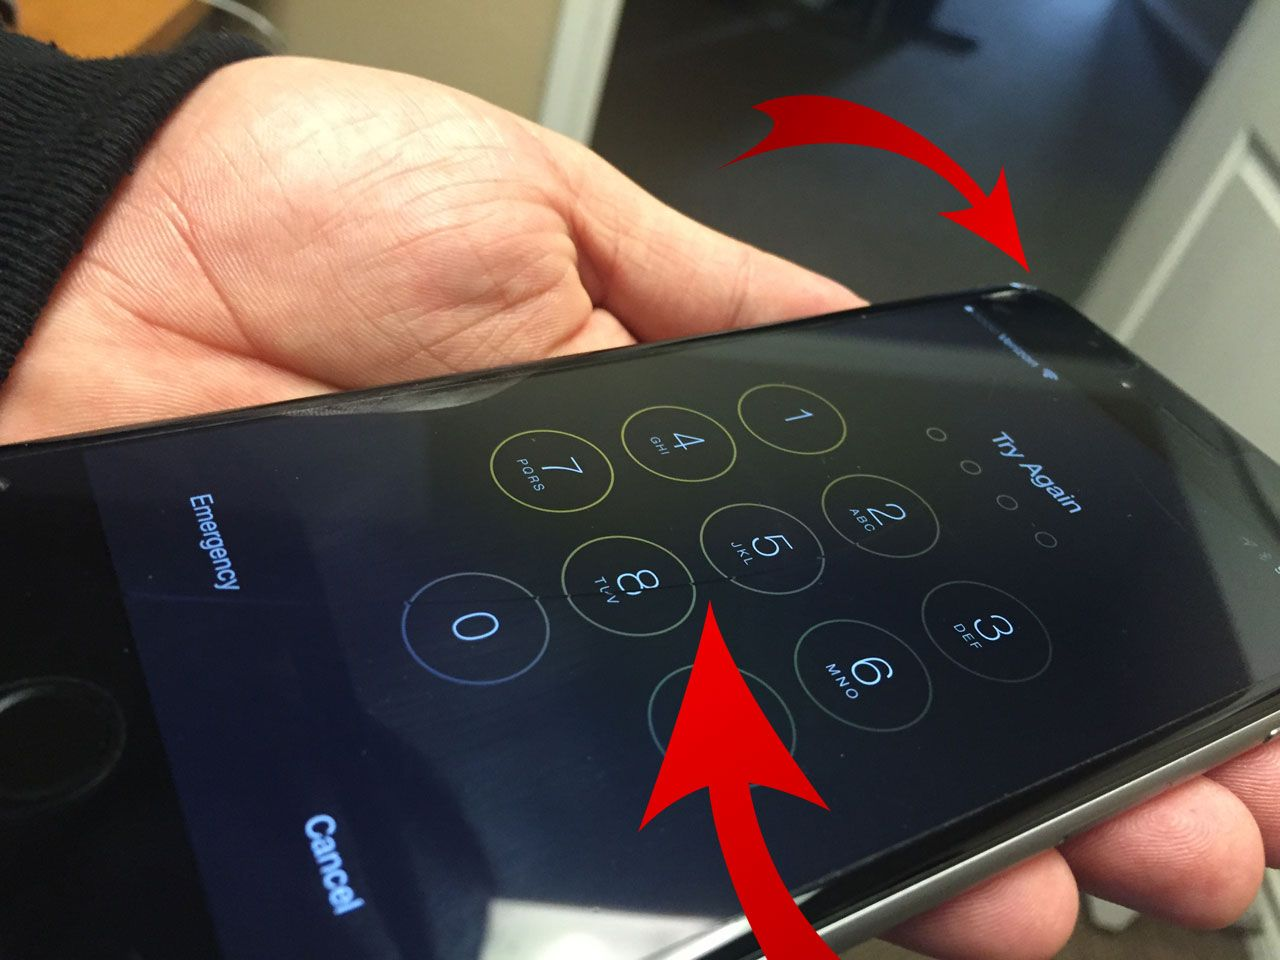 iphone6-plus-crack-screen.jpg